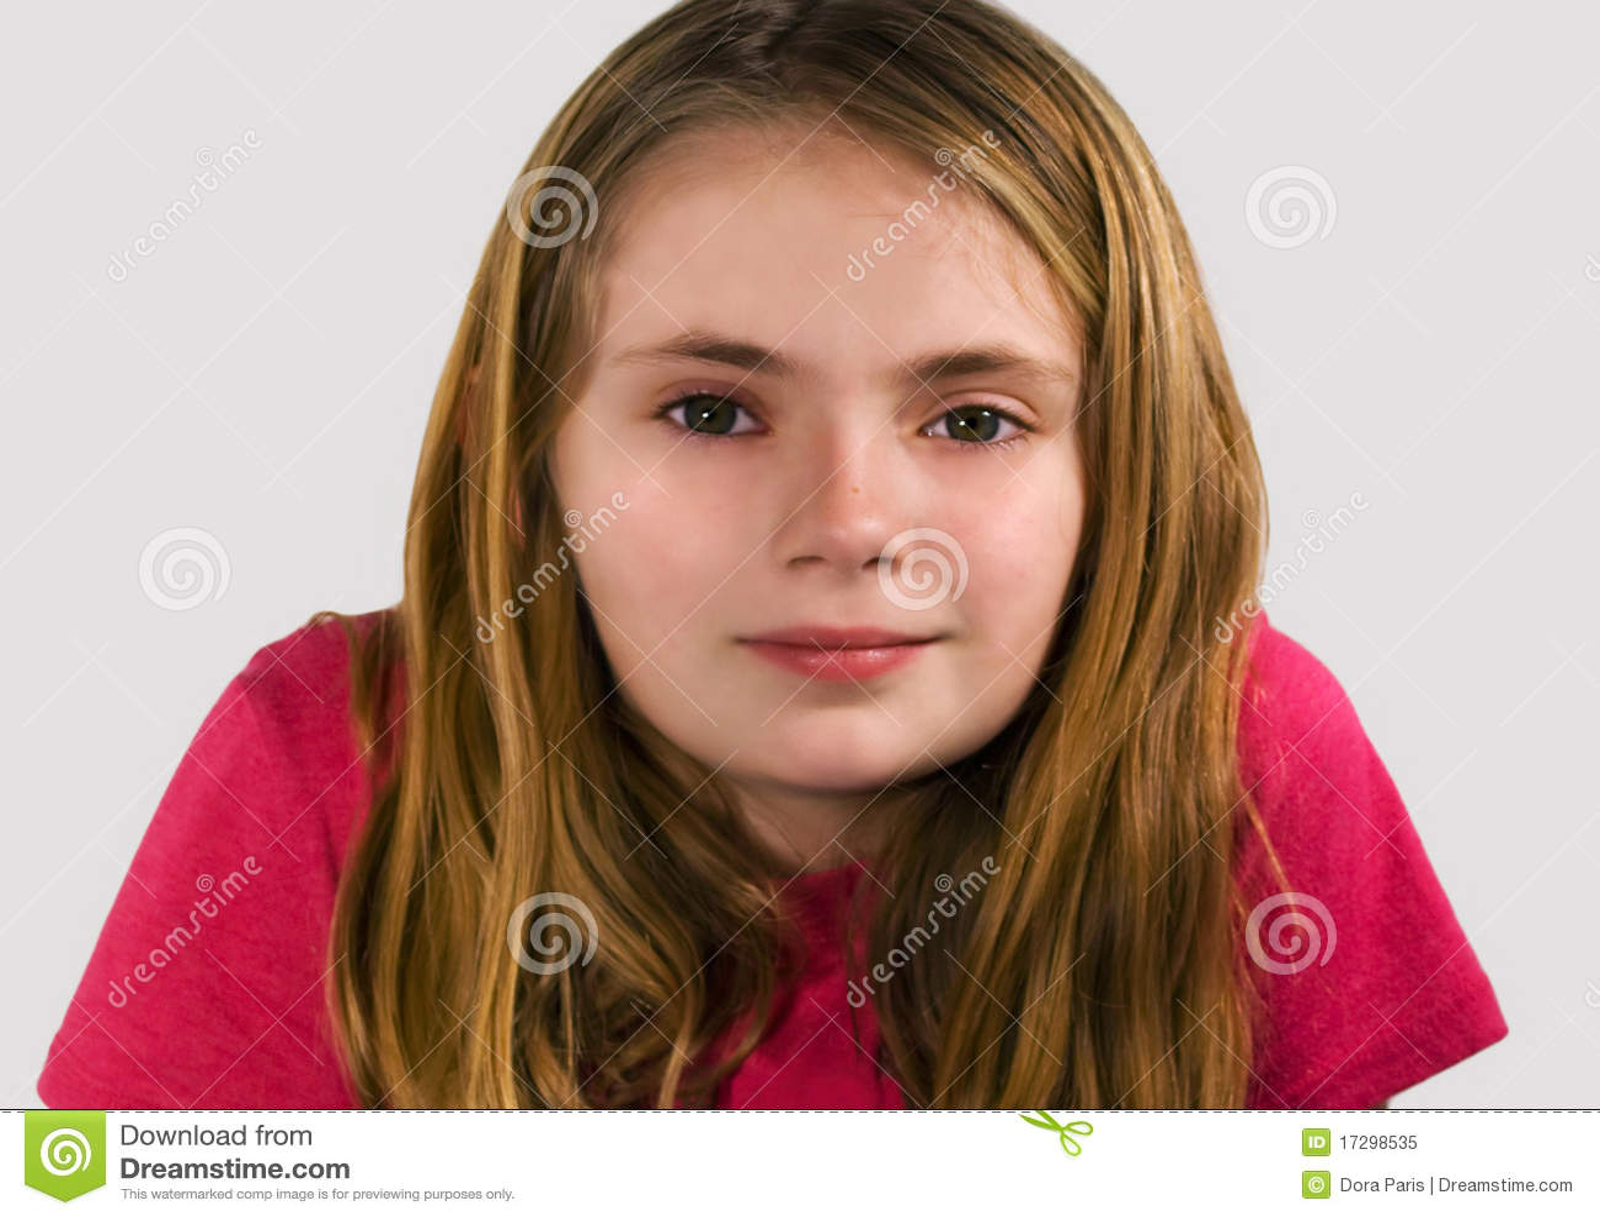 Soft focus portrait of pretty preteen girl smiling at camera.